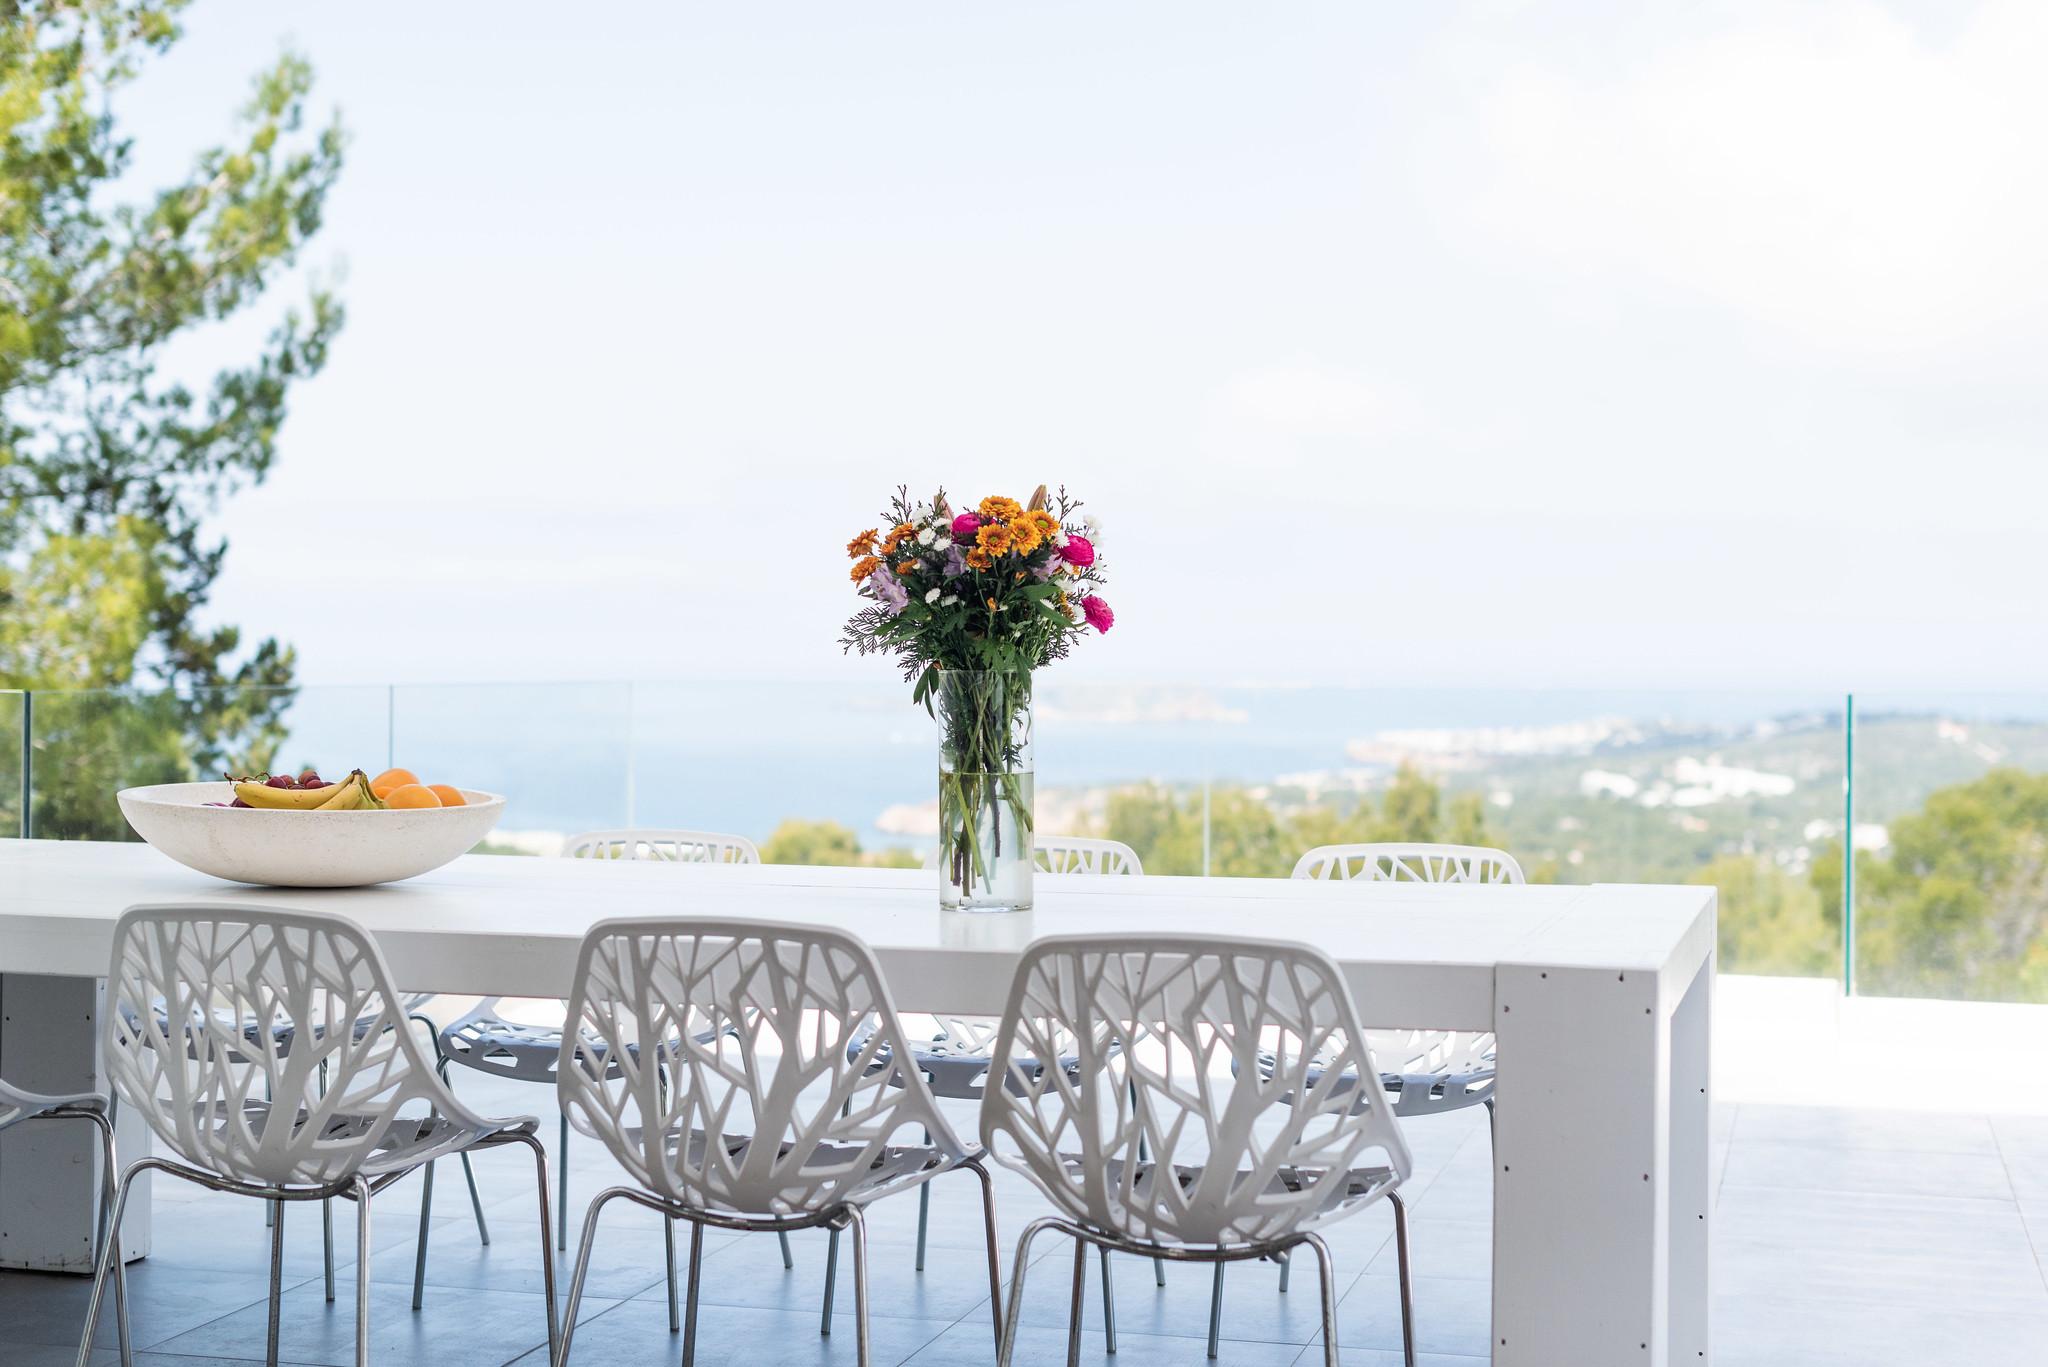 https://www.white-ibiza.com/wp-content/uploads/2020/05/white-ibiza-villas-can-dela-terrace-view.jpg